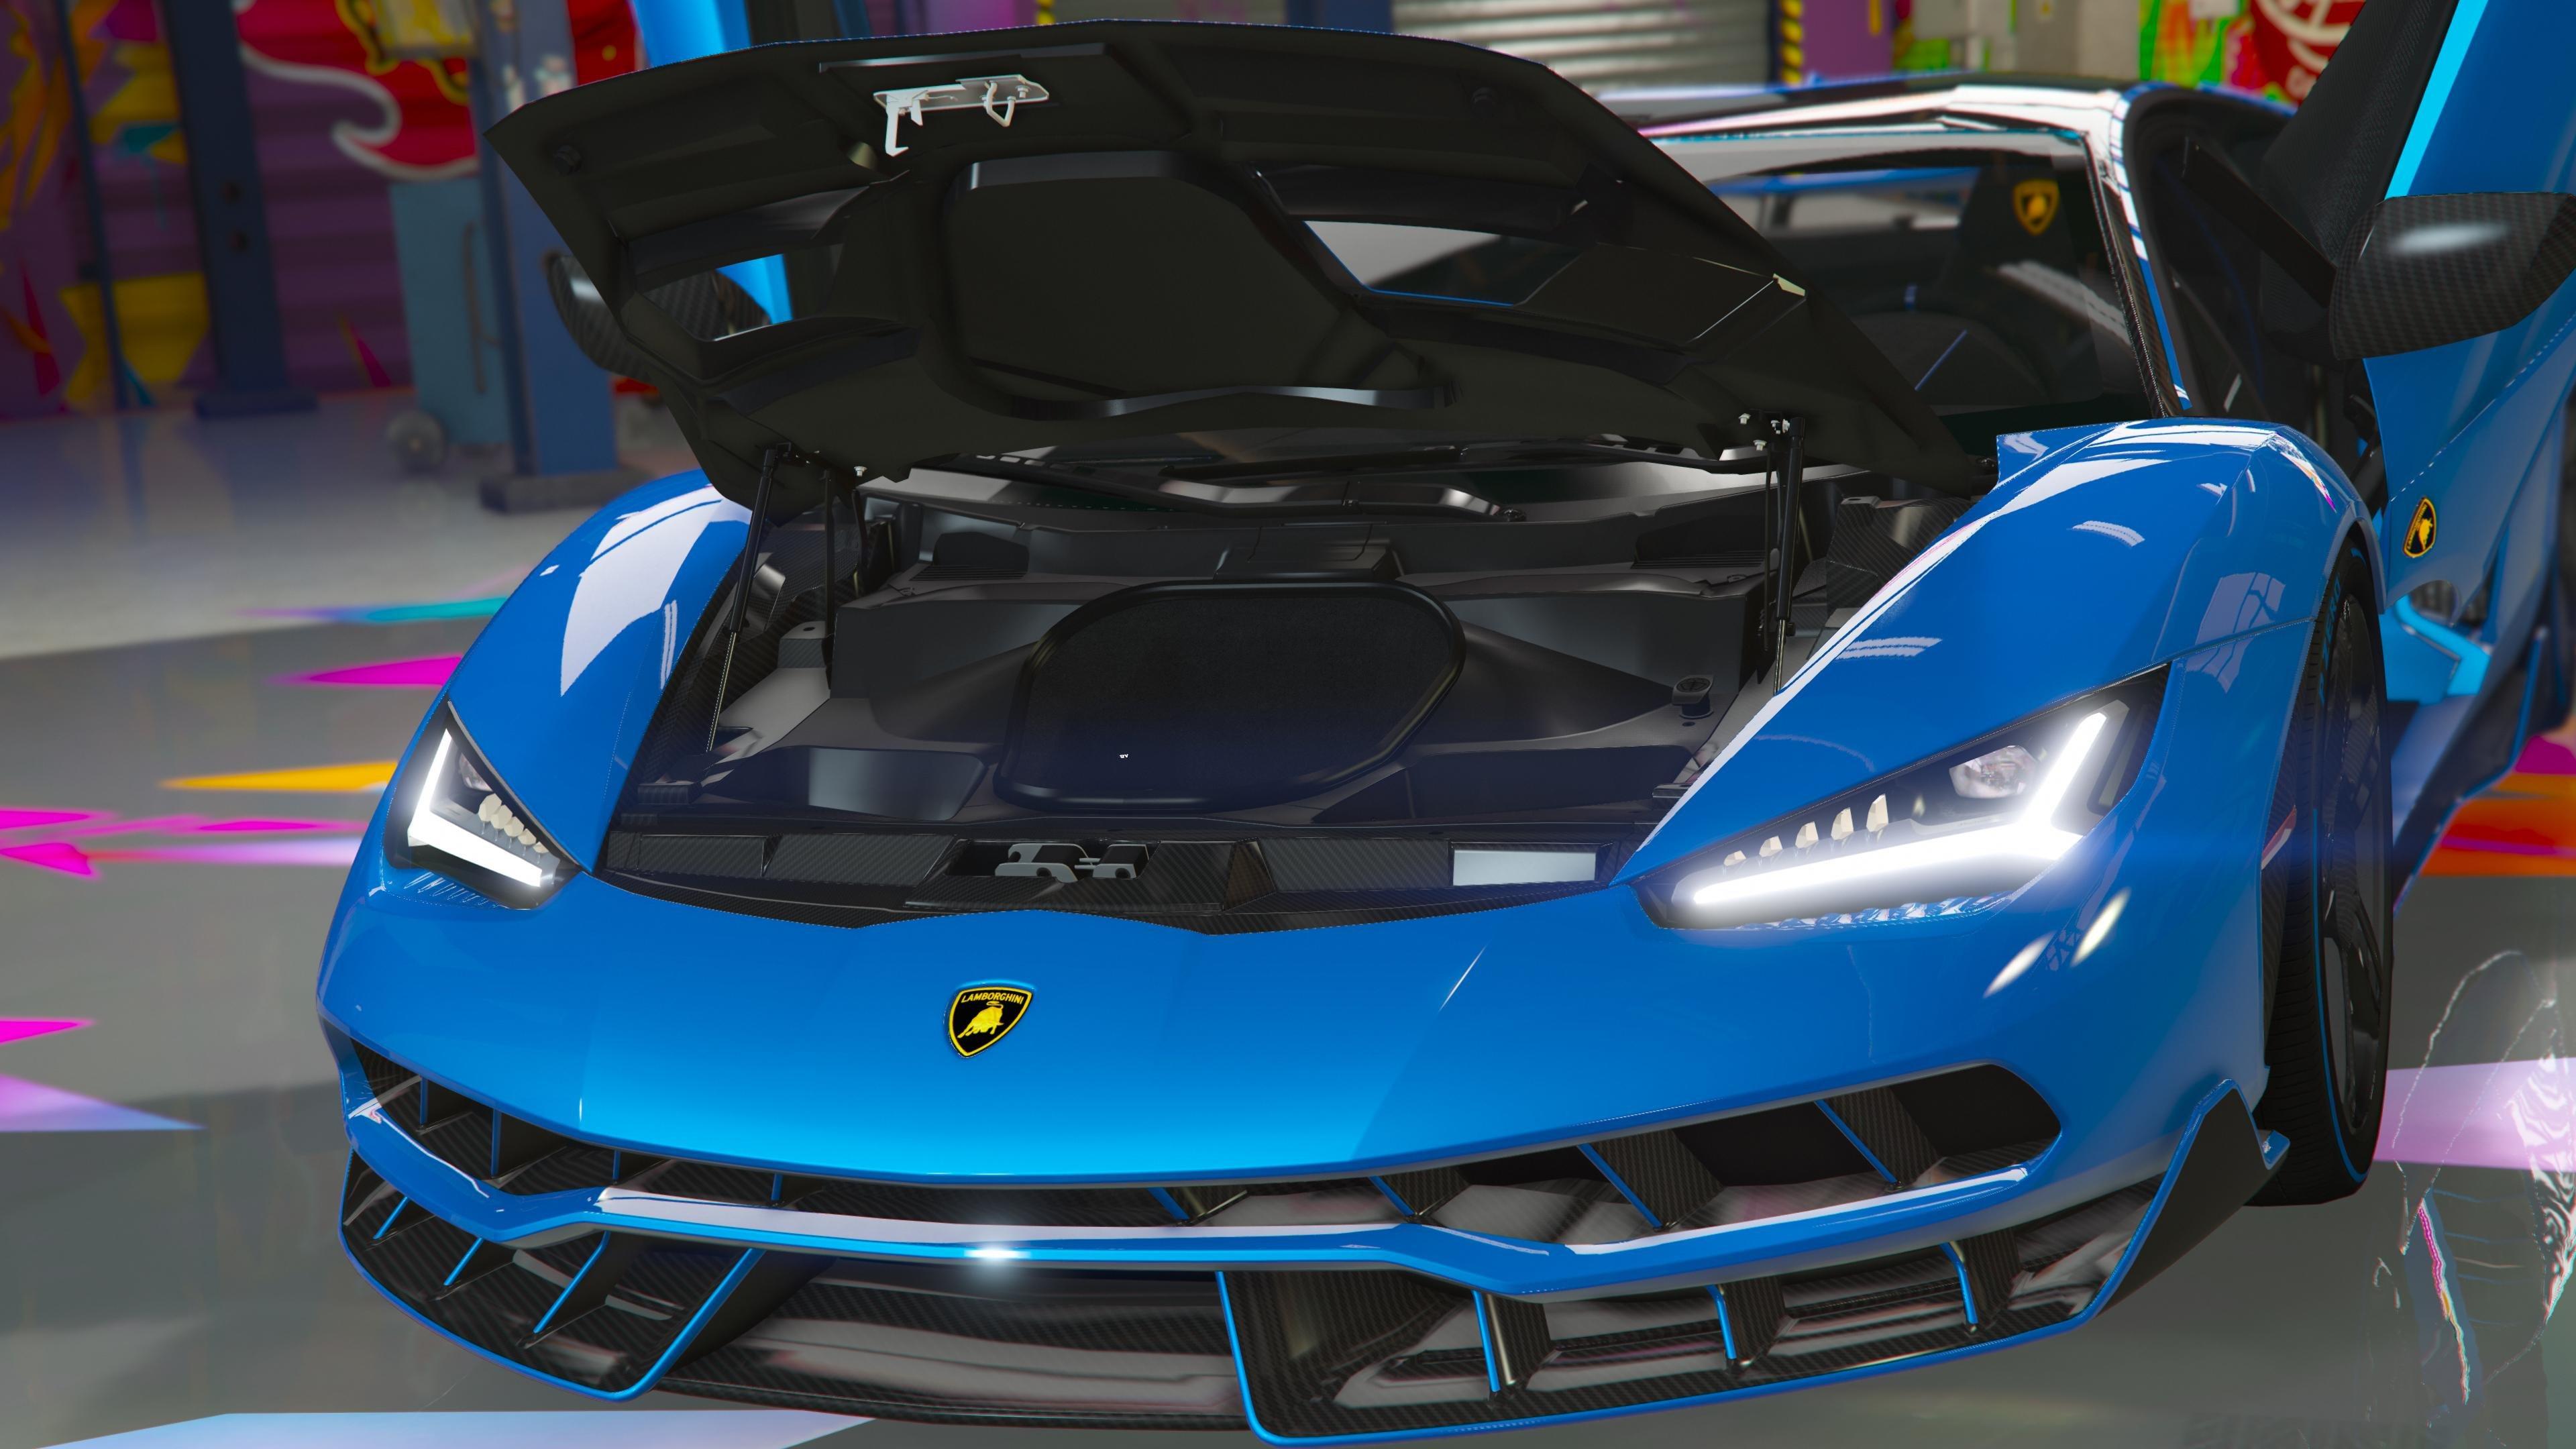 51de1a 14 Lamborghini Centenario By Gta5korn